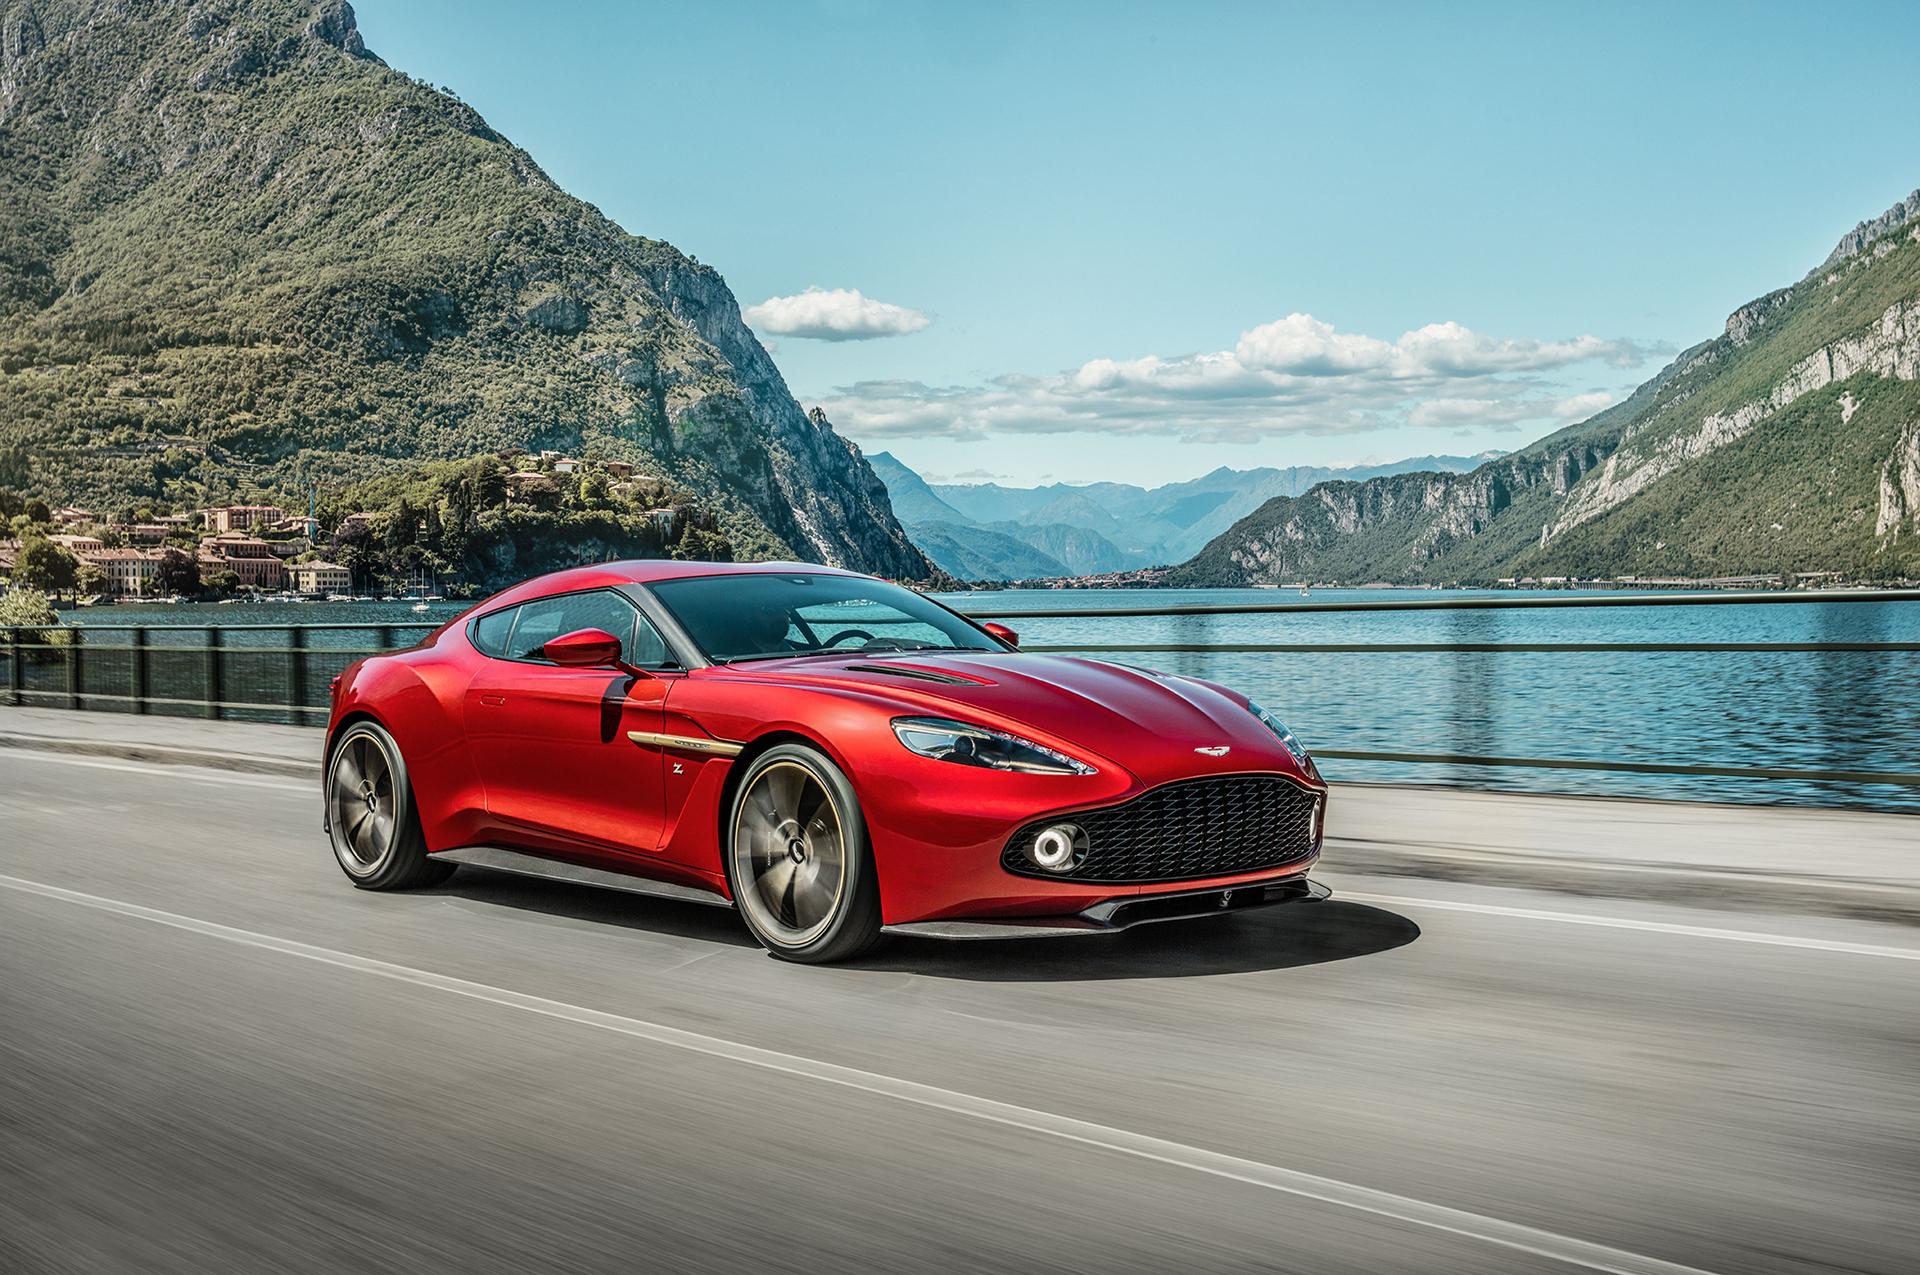 Aston Martin Unveils Limited Edition Vanquish Zagato © Aston Martin Lagonda Limited